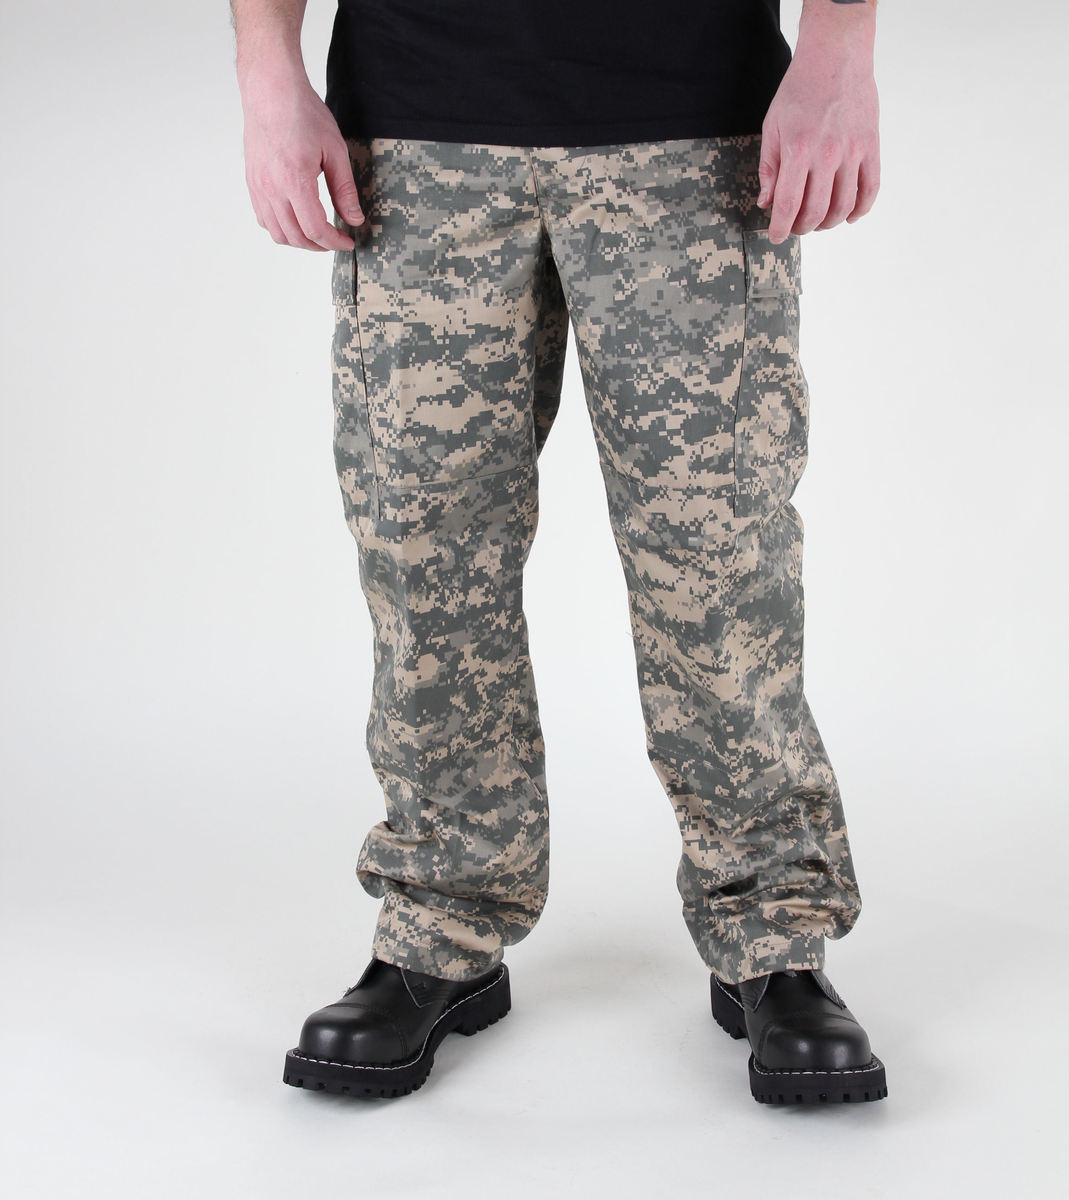 kalhoty pánské MIL-TEC - US Feldhose - AT-Digital - 11805070